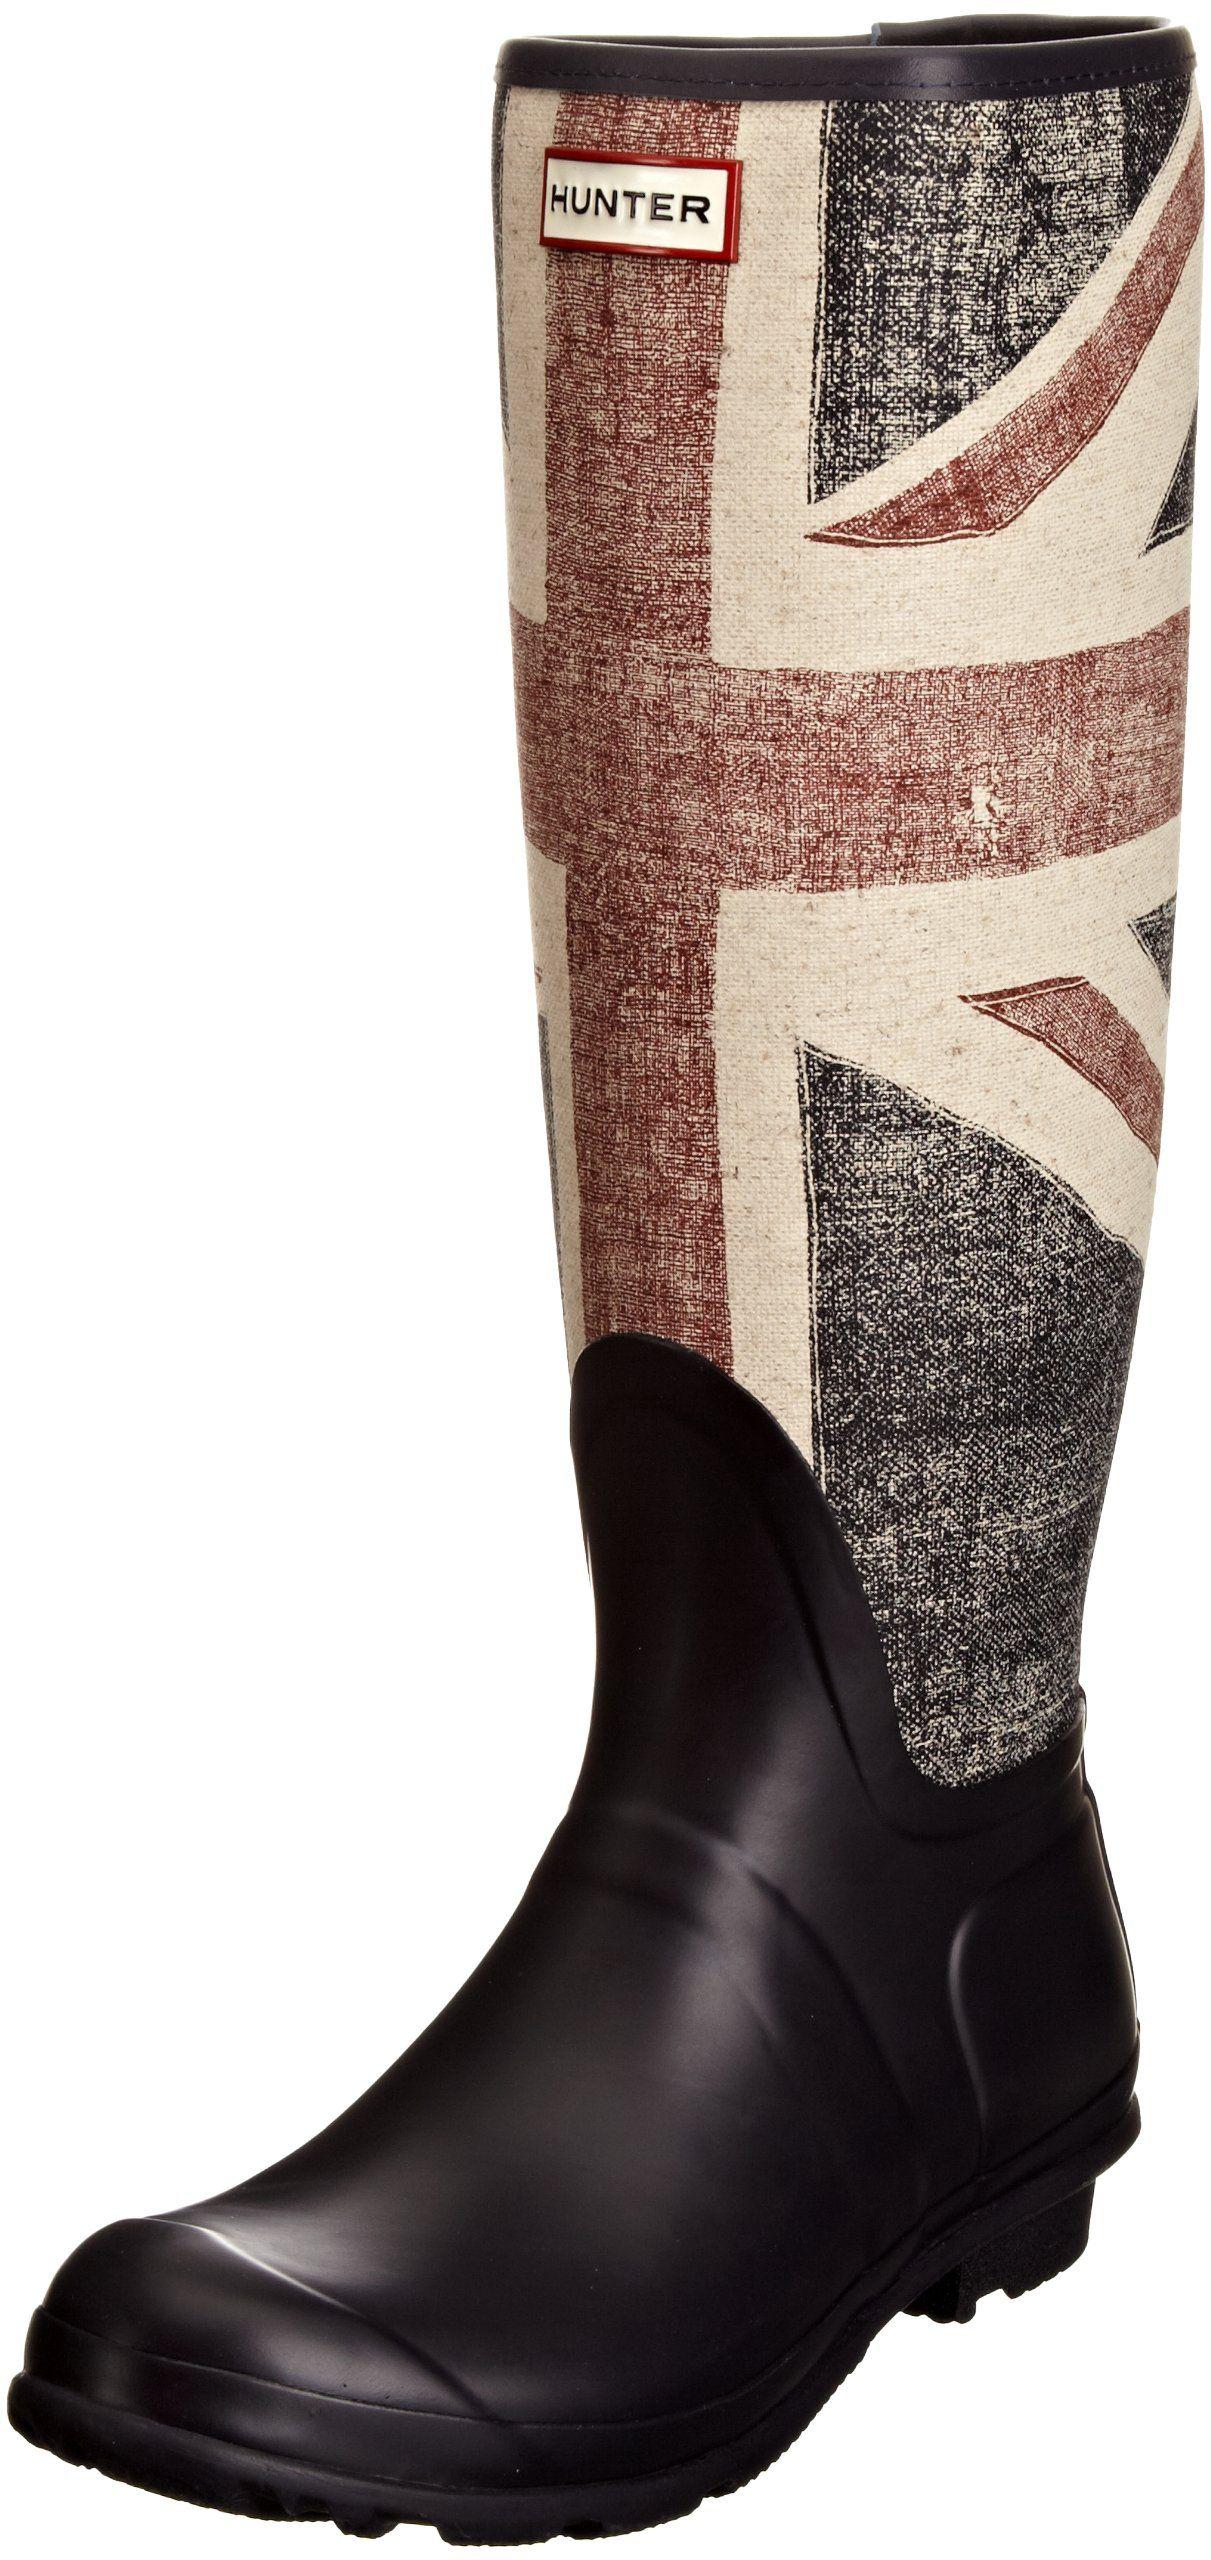 Hunter Original Brit, Damen Stiefel: Amazon.de: Schuhe & Handtaschen